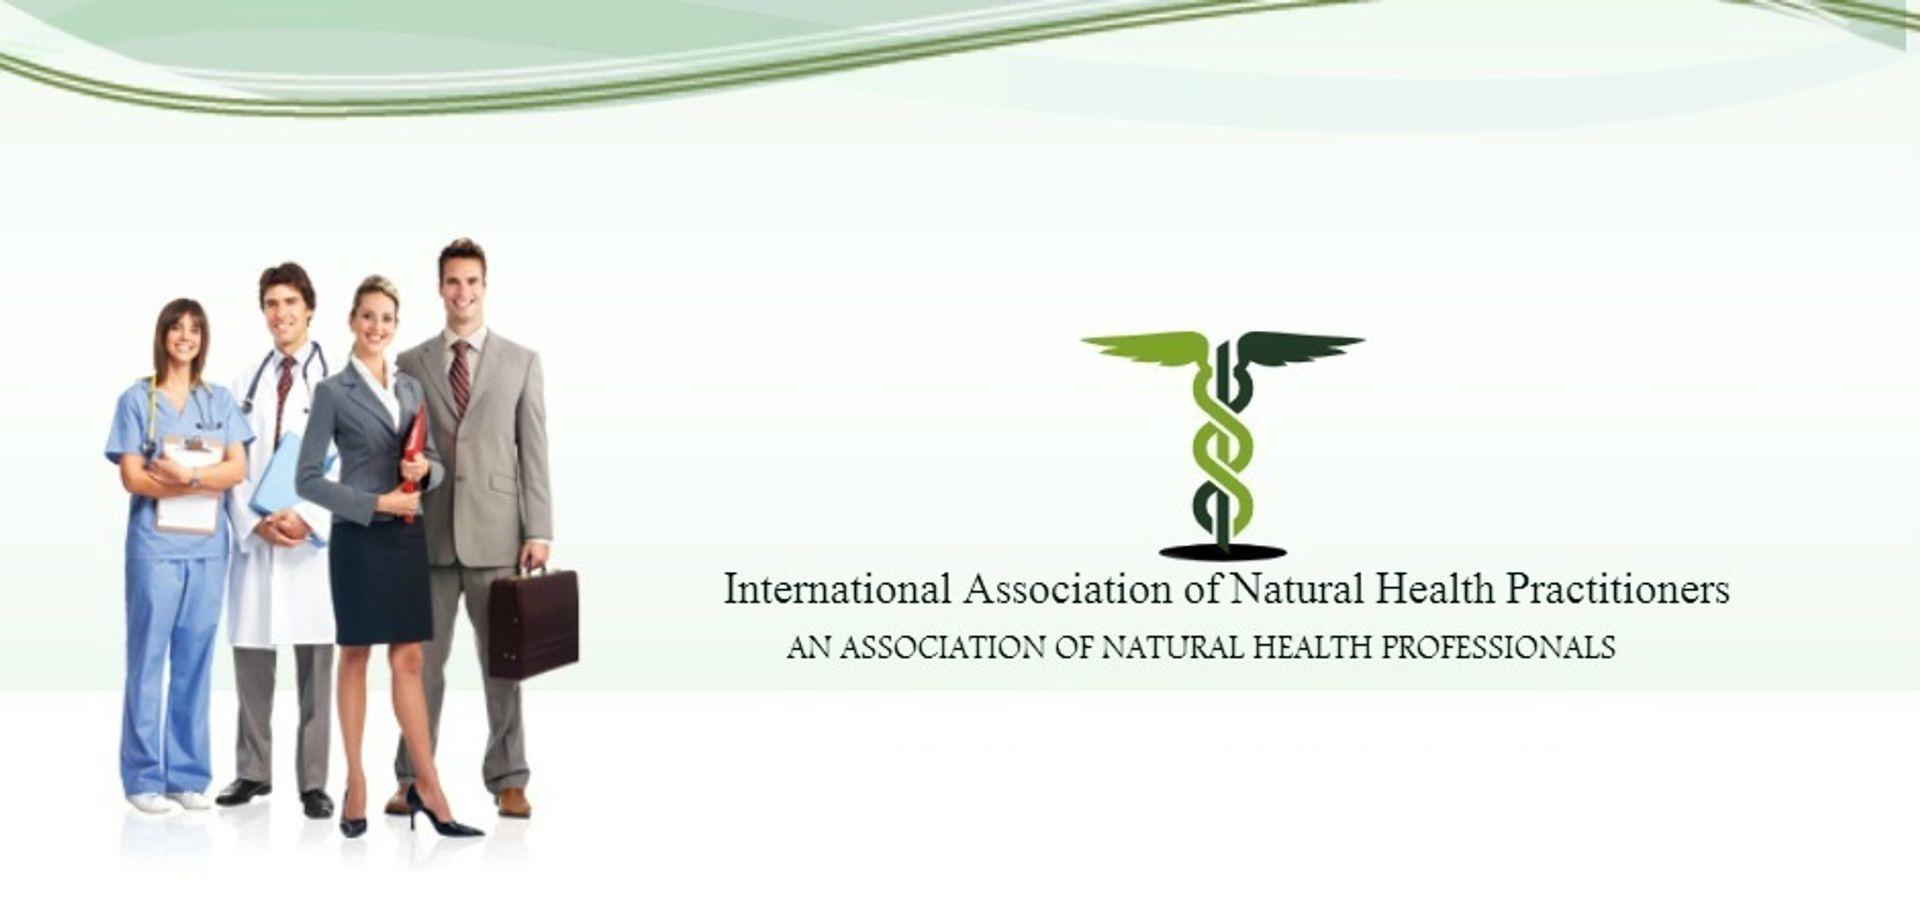 Professional registration and membership